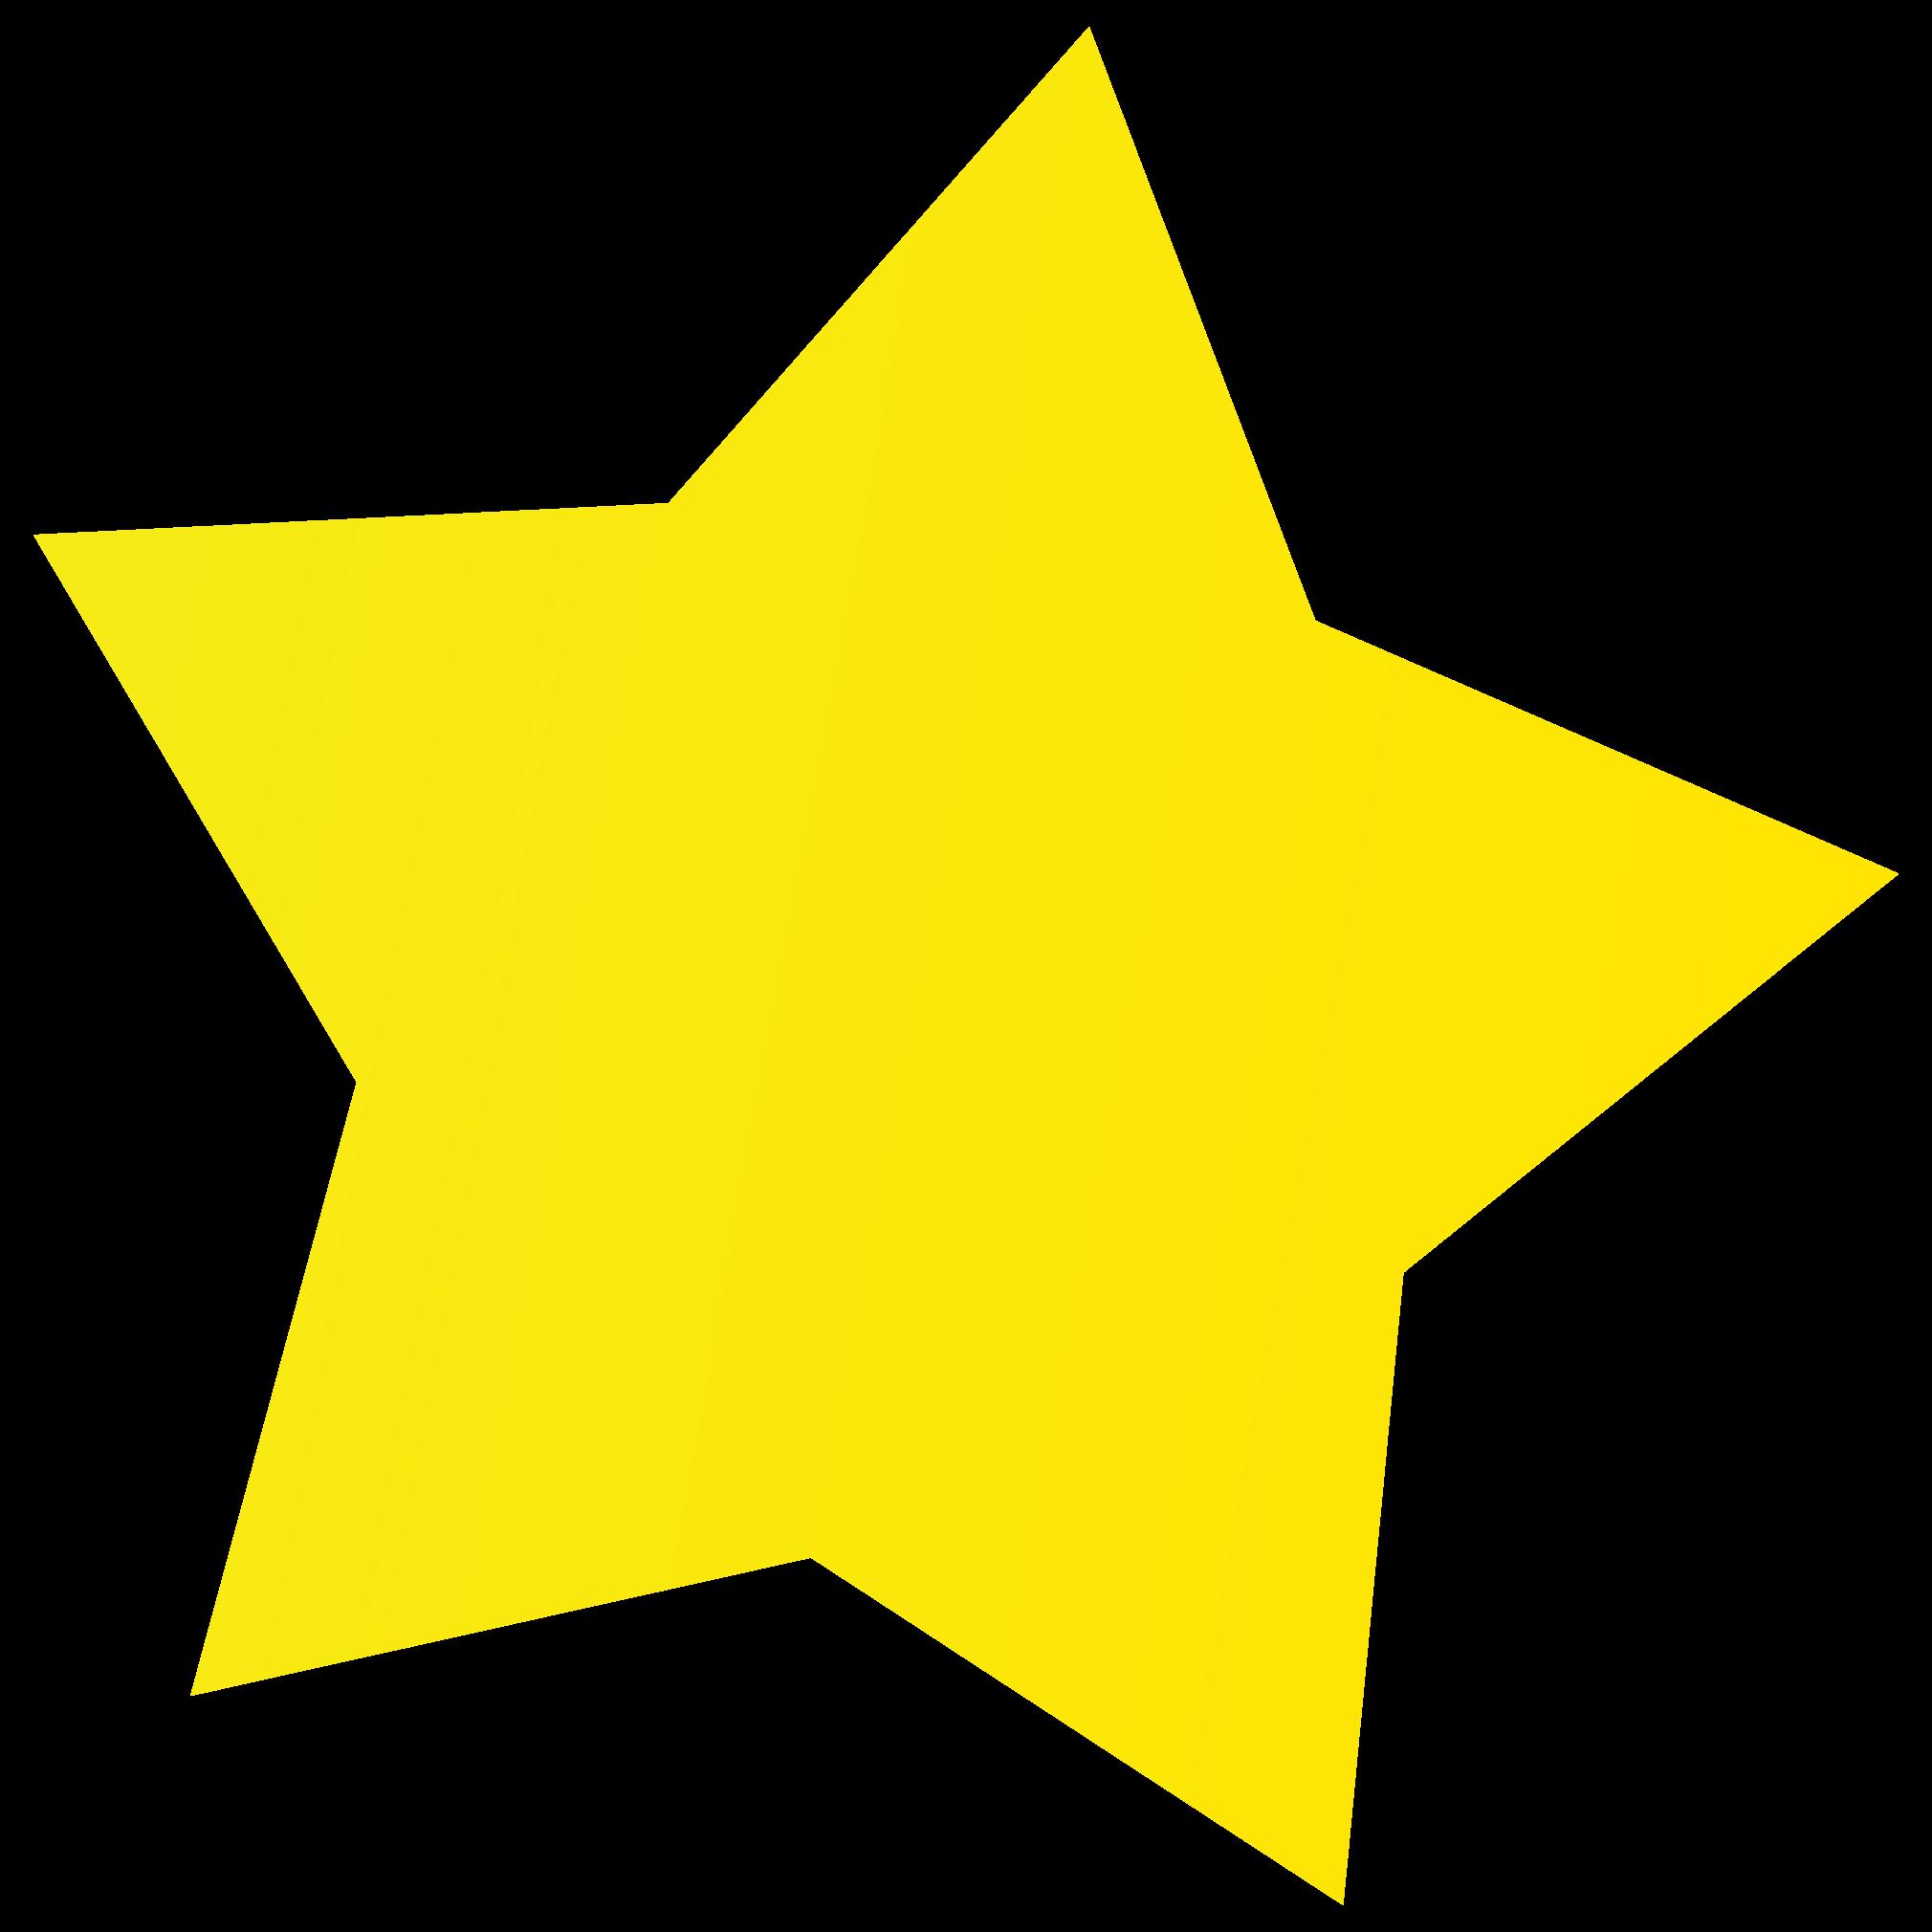 Clip Art Star Png ClipArt Best-Clip Art Star Png ClipArt Best-2